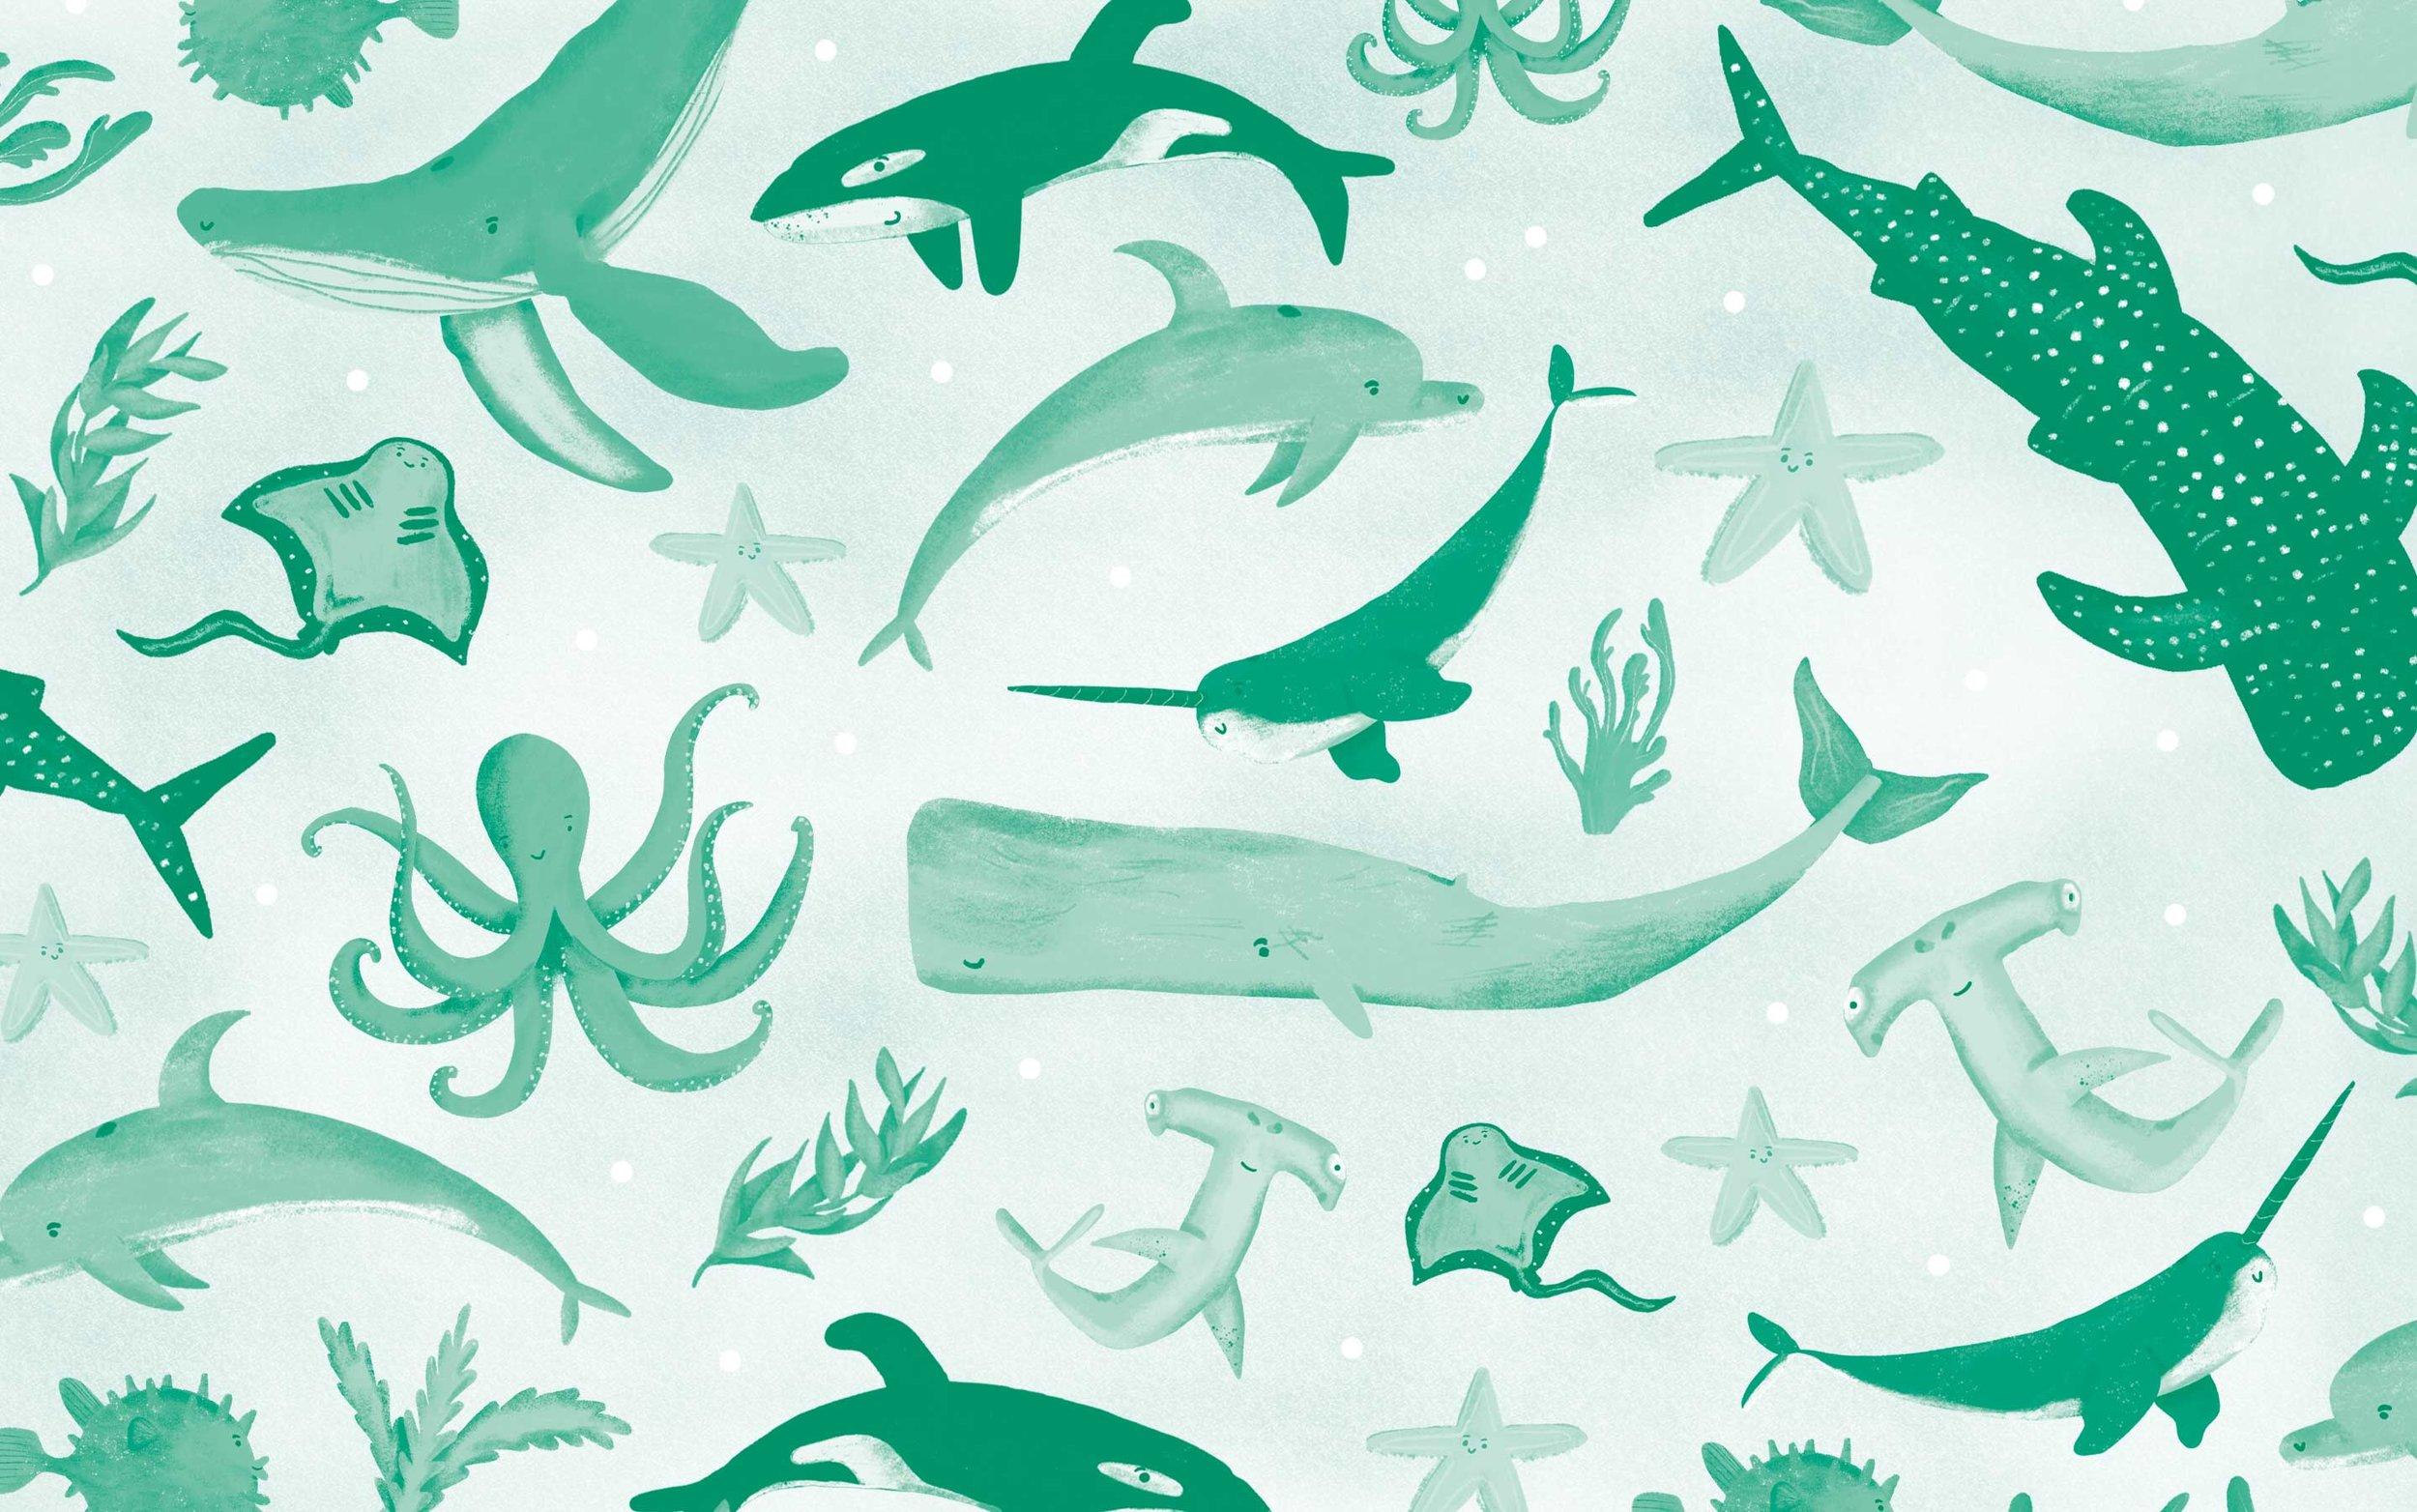 Wallpaper-Jack-Carter-Jun-19-Small-File.jpg